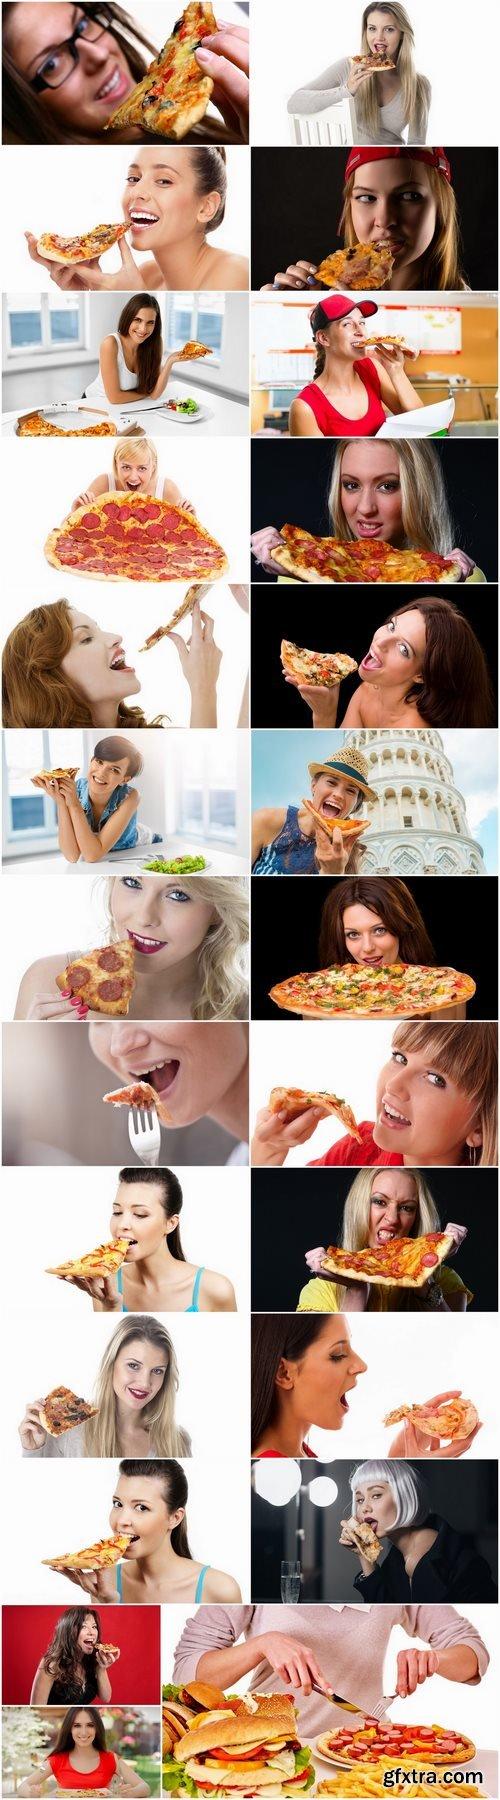 Woman girl eating pizza 25 HQ Jpeg